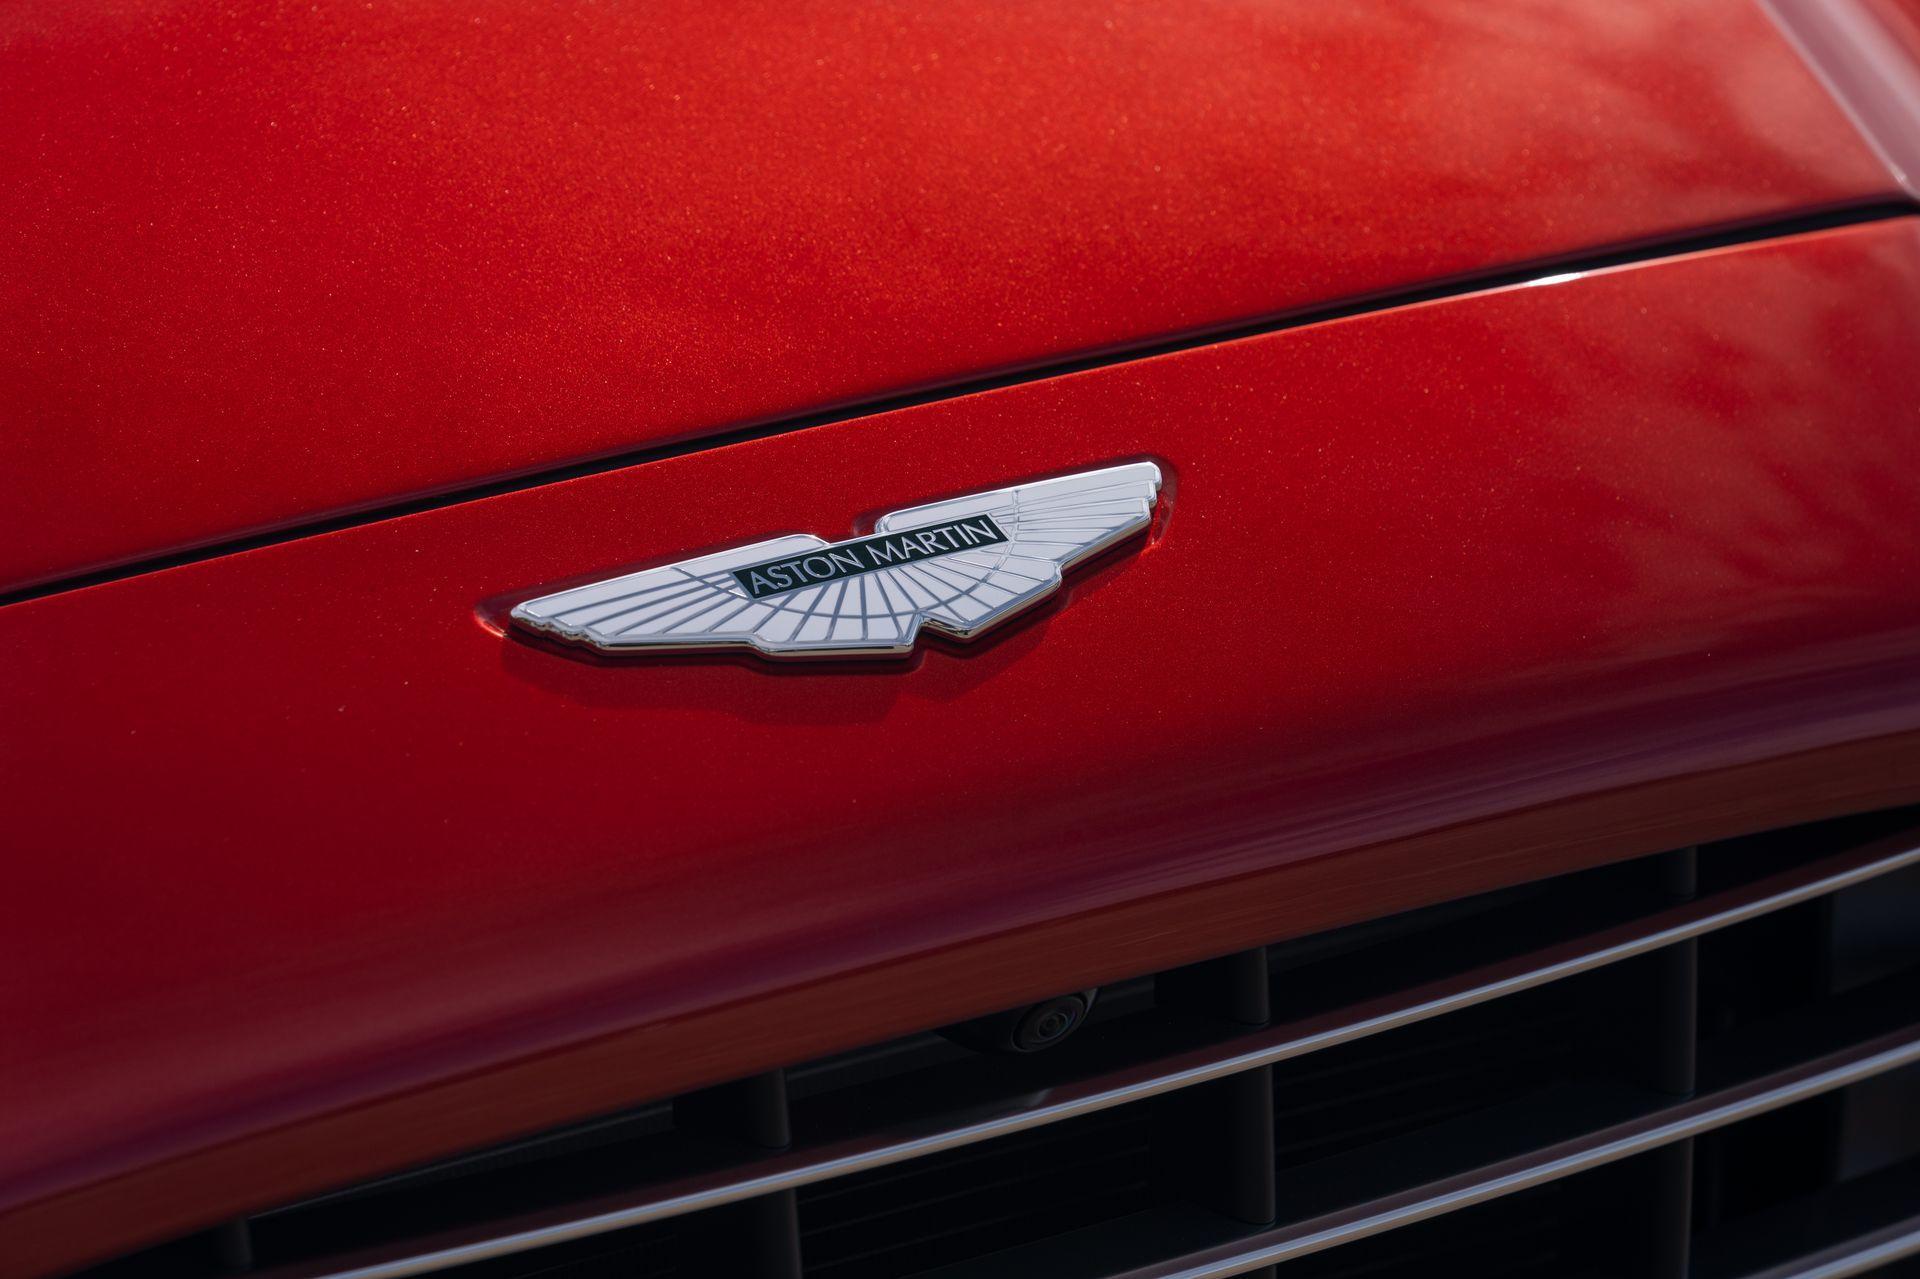 Aston Martin Dbx Fotos Oficiales 4